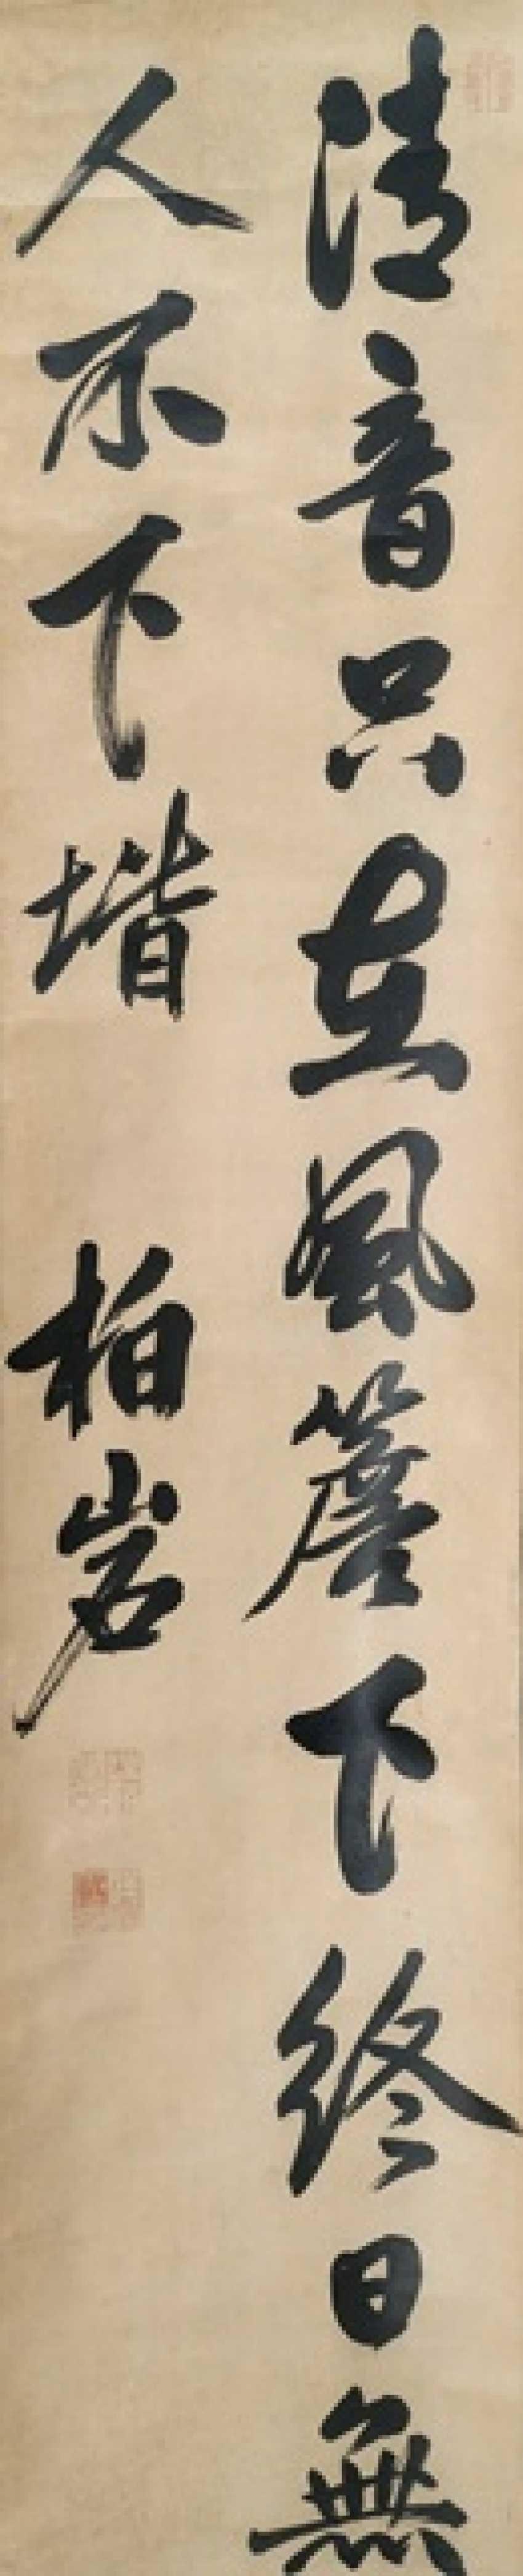 Ôbaku Hakugan - photo 1